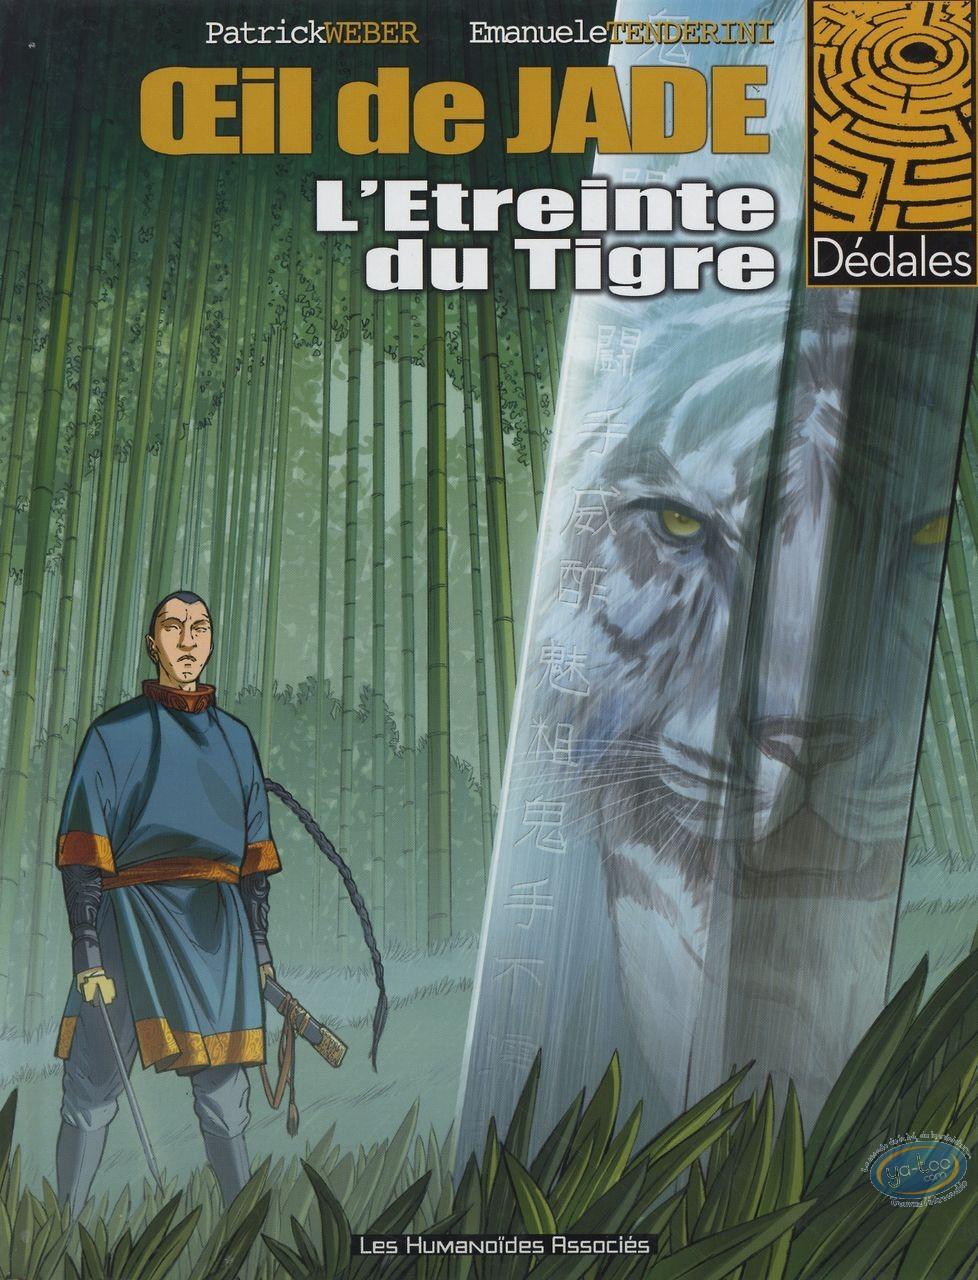 BD occasion, Oeil de Jade : L'Etreinte du Tigre